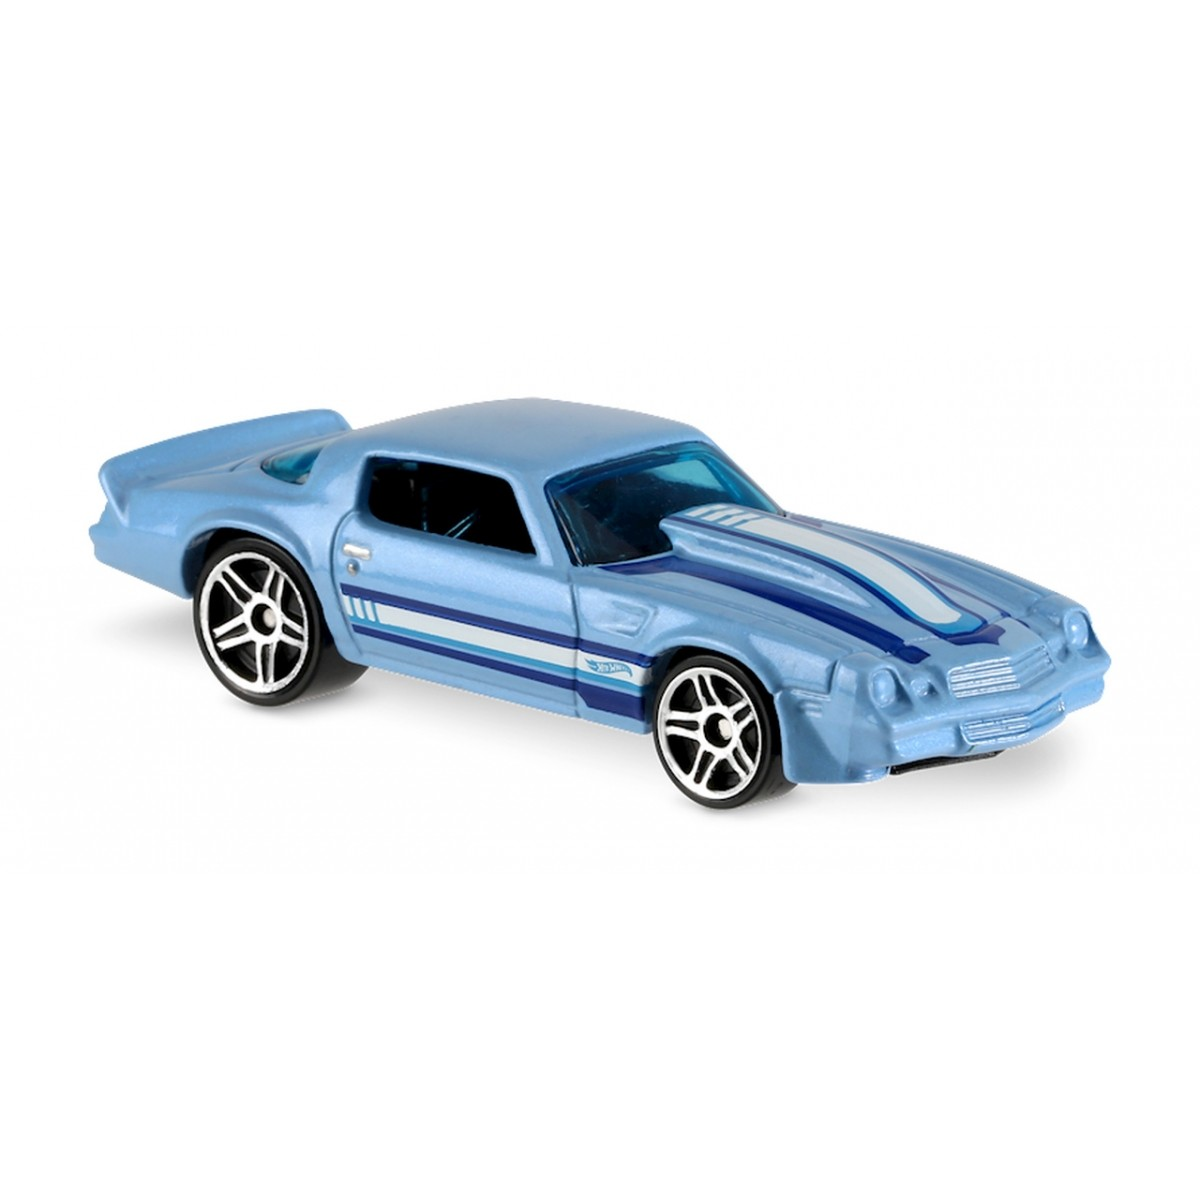 Carrinho Hot Wheels: '81 Camaro Azul